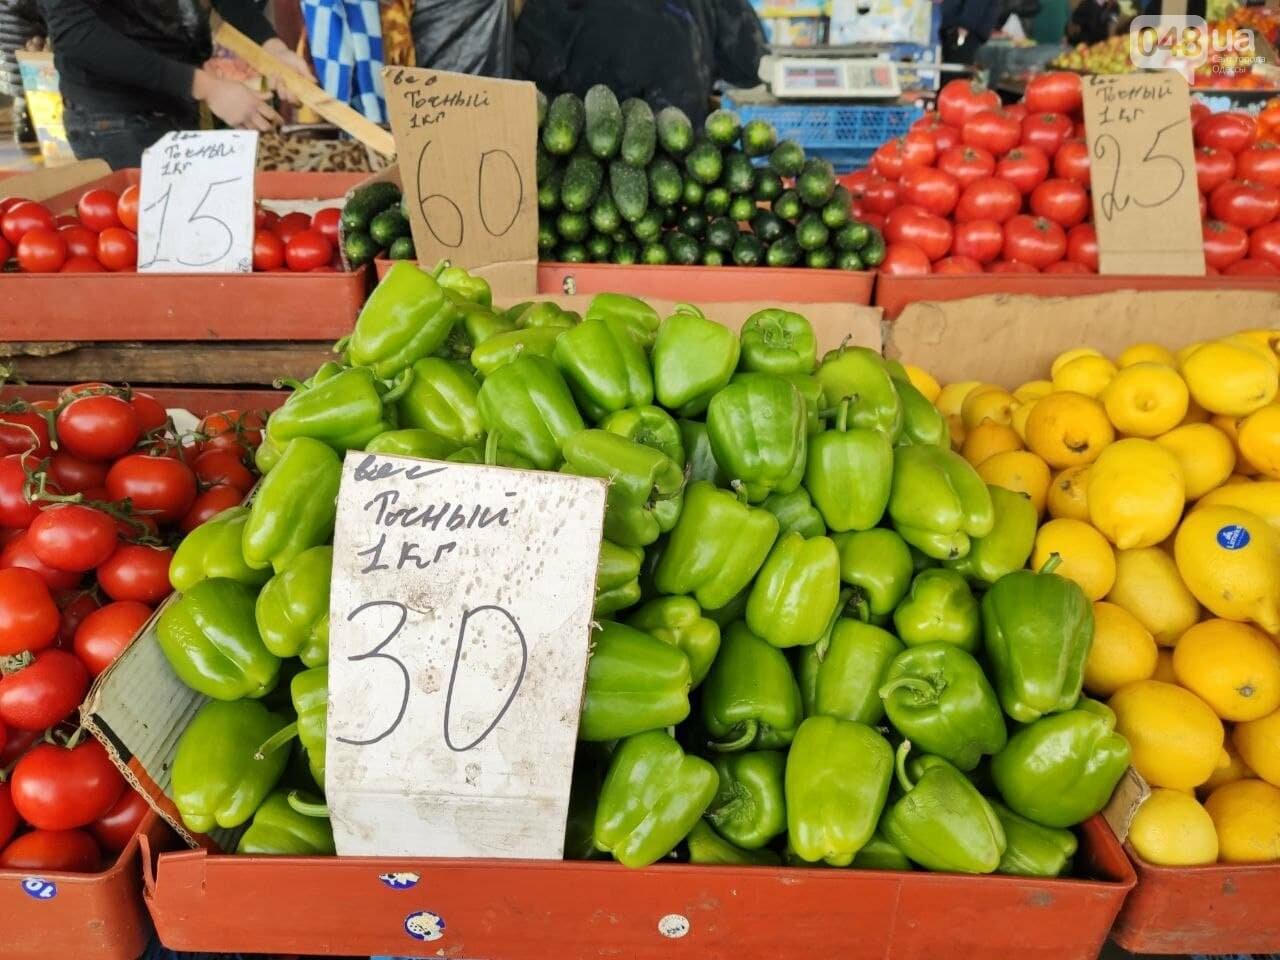 Топинамбур, помело, редис: почем на одесском Привозе фрукты и овощи, - ФОТО, фото-1